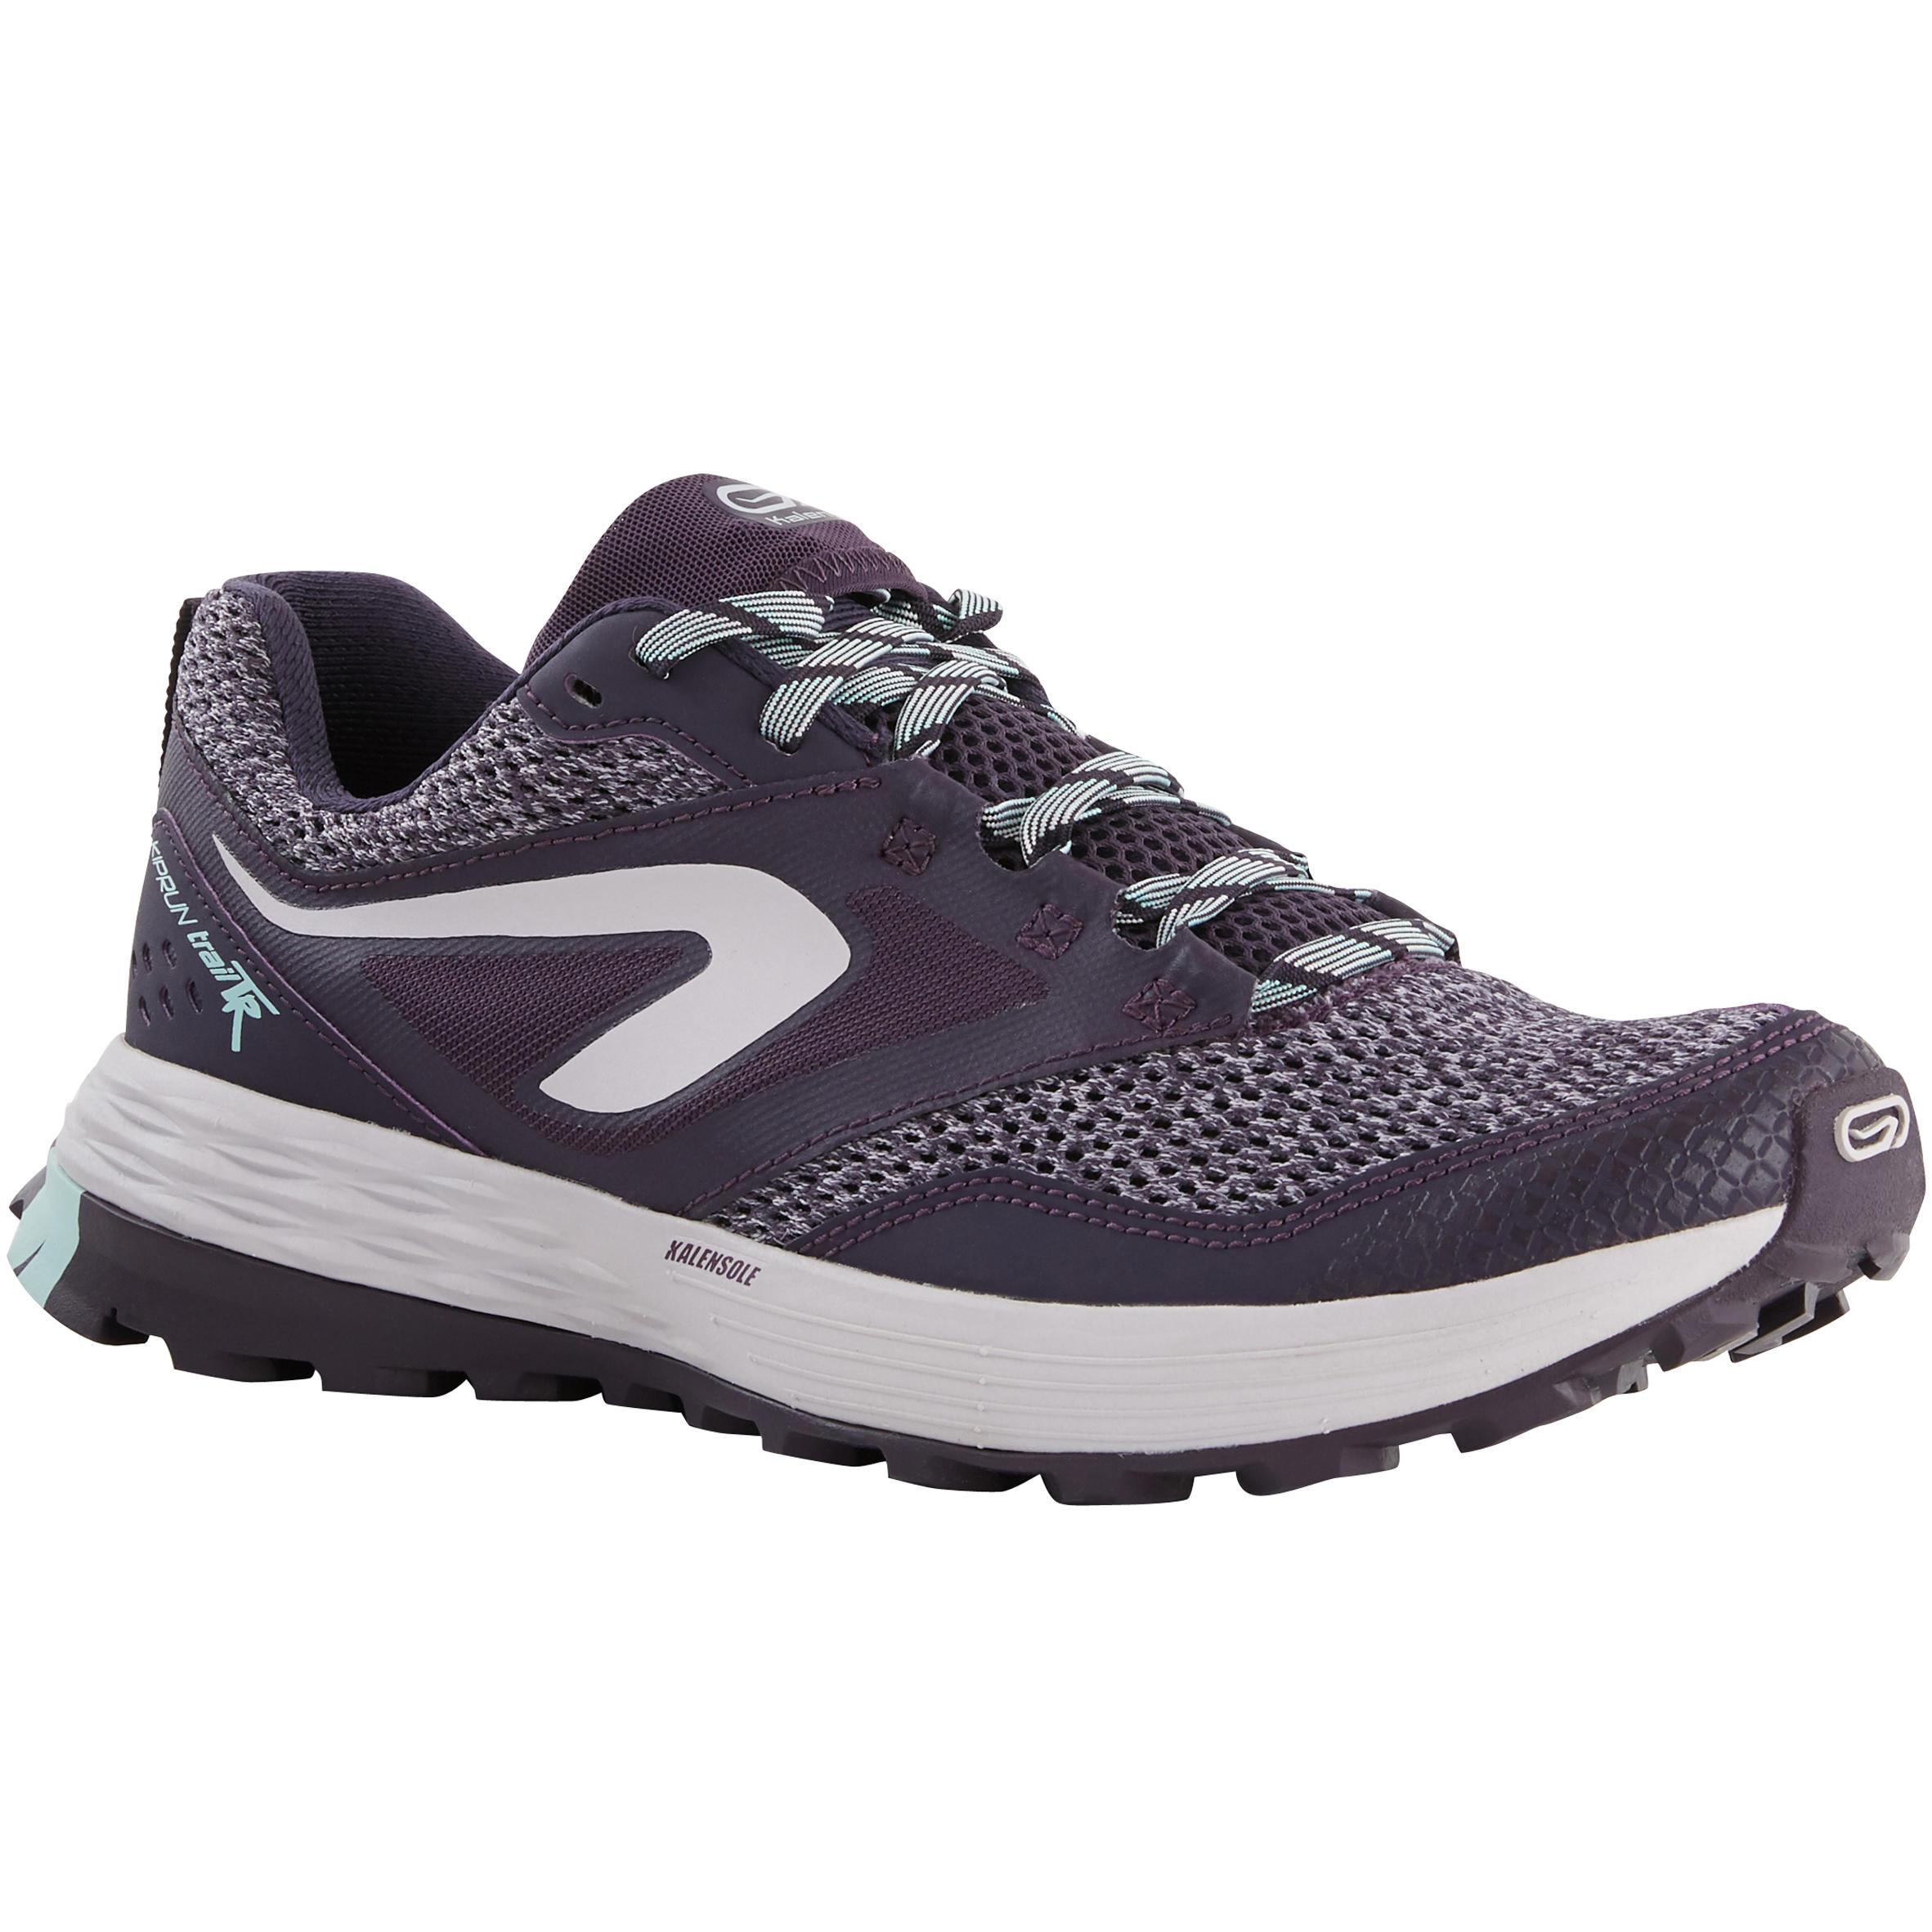 Femme Running Tr Violet Lilas Chaussure Trail Kiprun bfyY76g